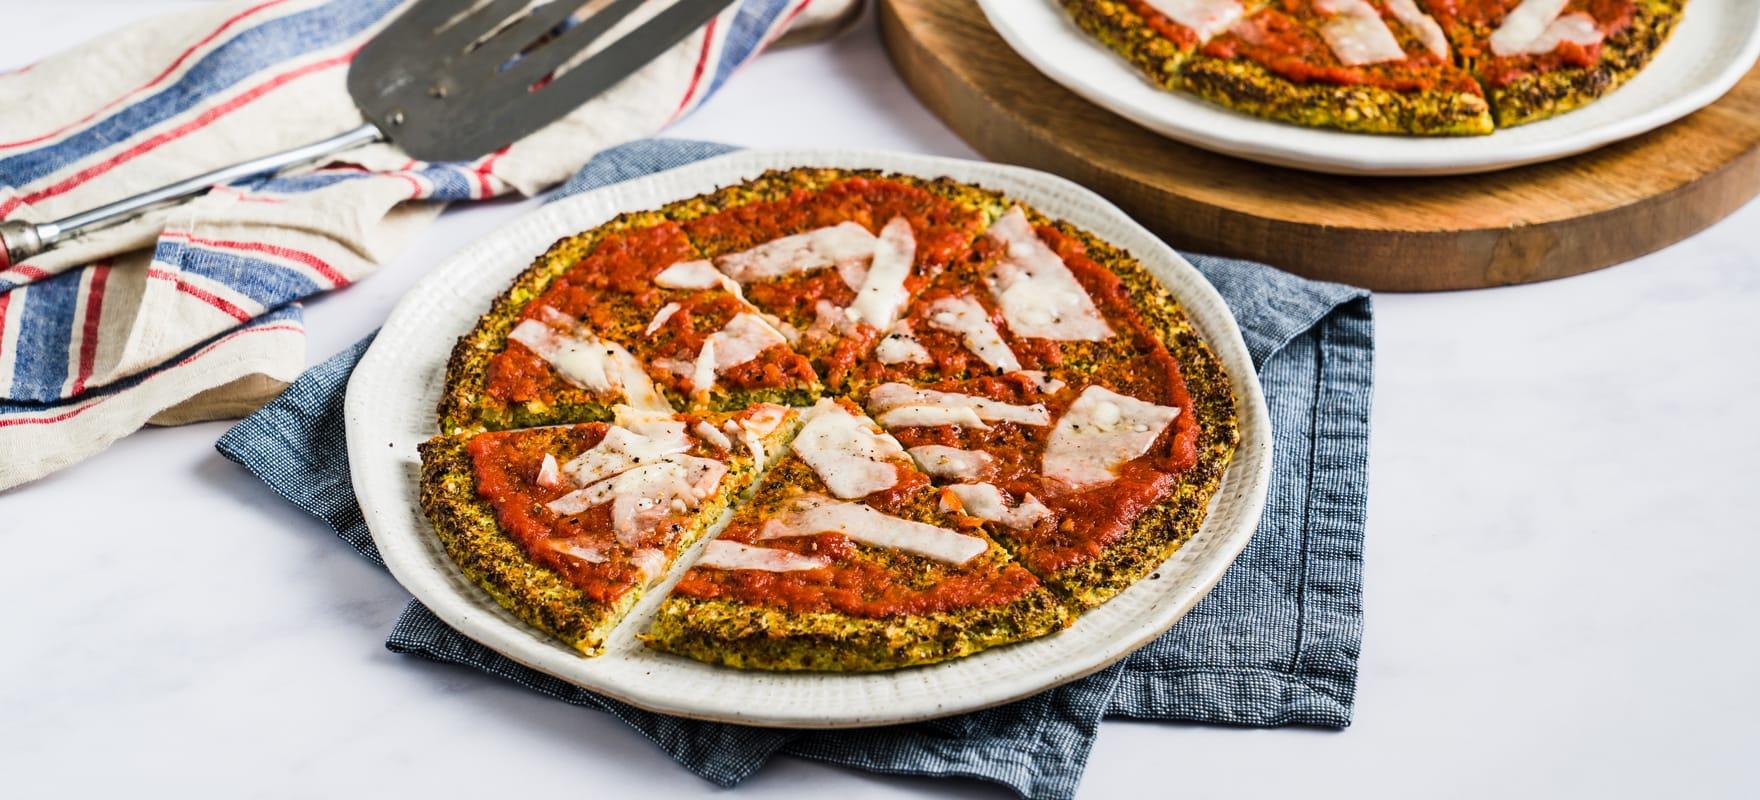 Broccoli & Parmesan pizza image 1